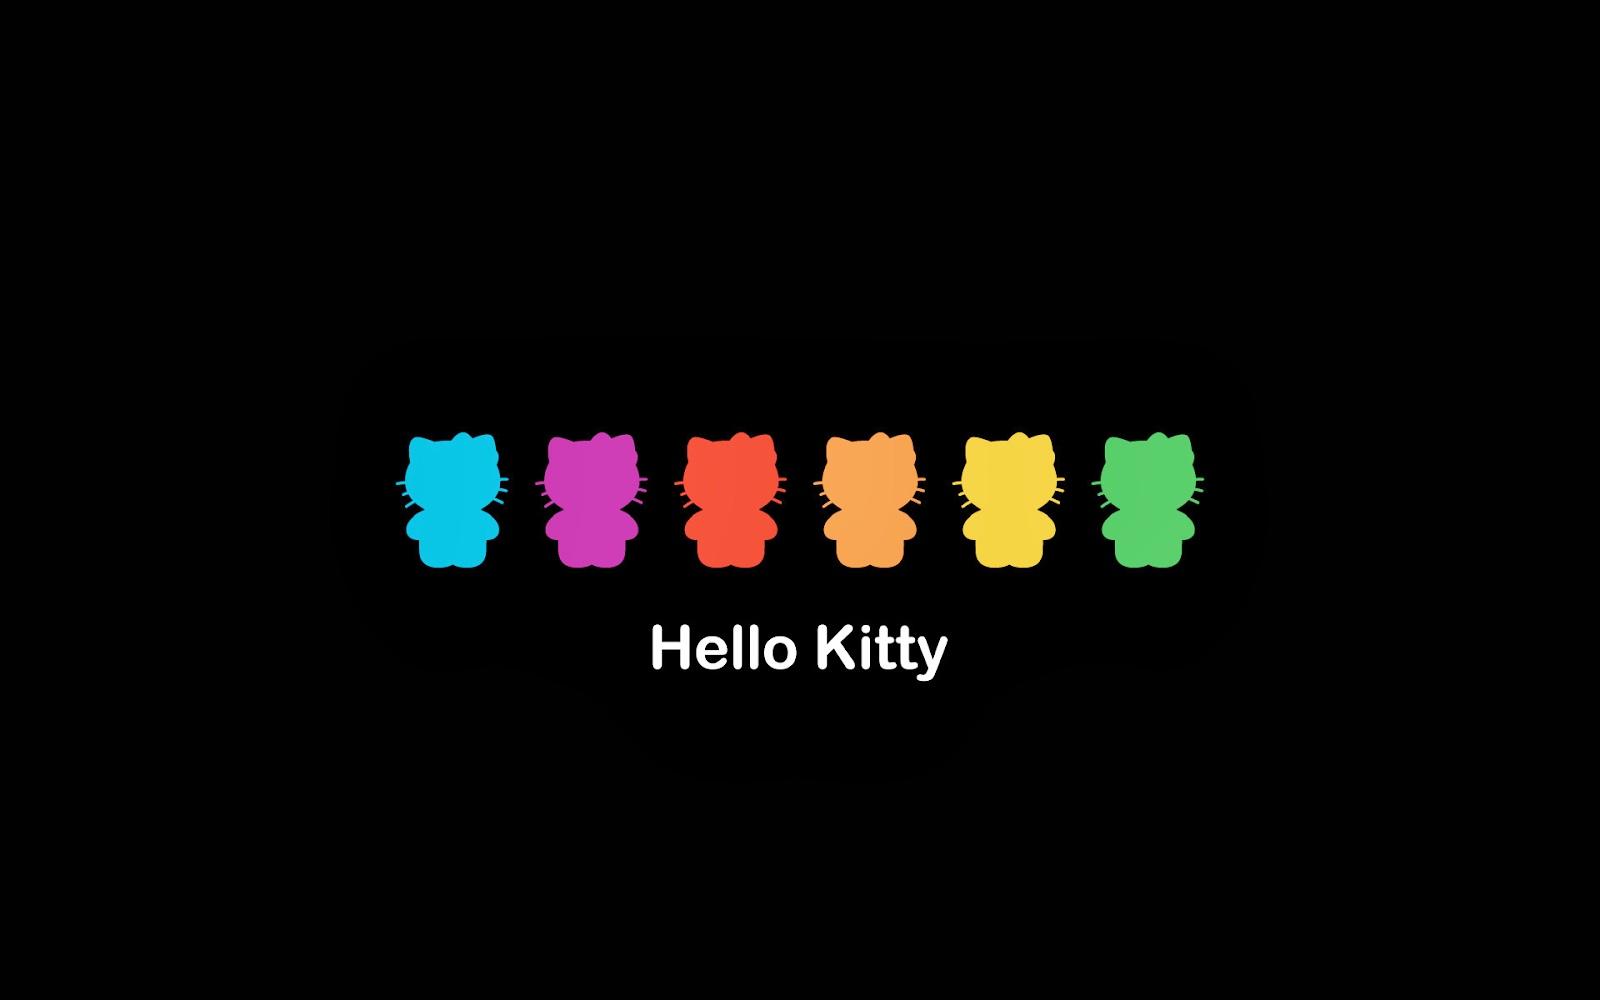 Cute Kitty Wallpapers Download Cool Wallpaper 可愛圖案 Hellokitty 可愛桌布05